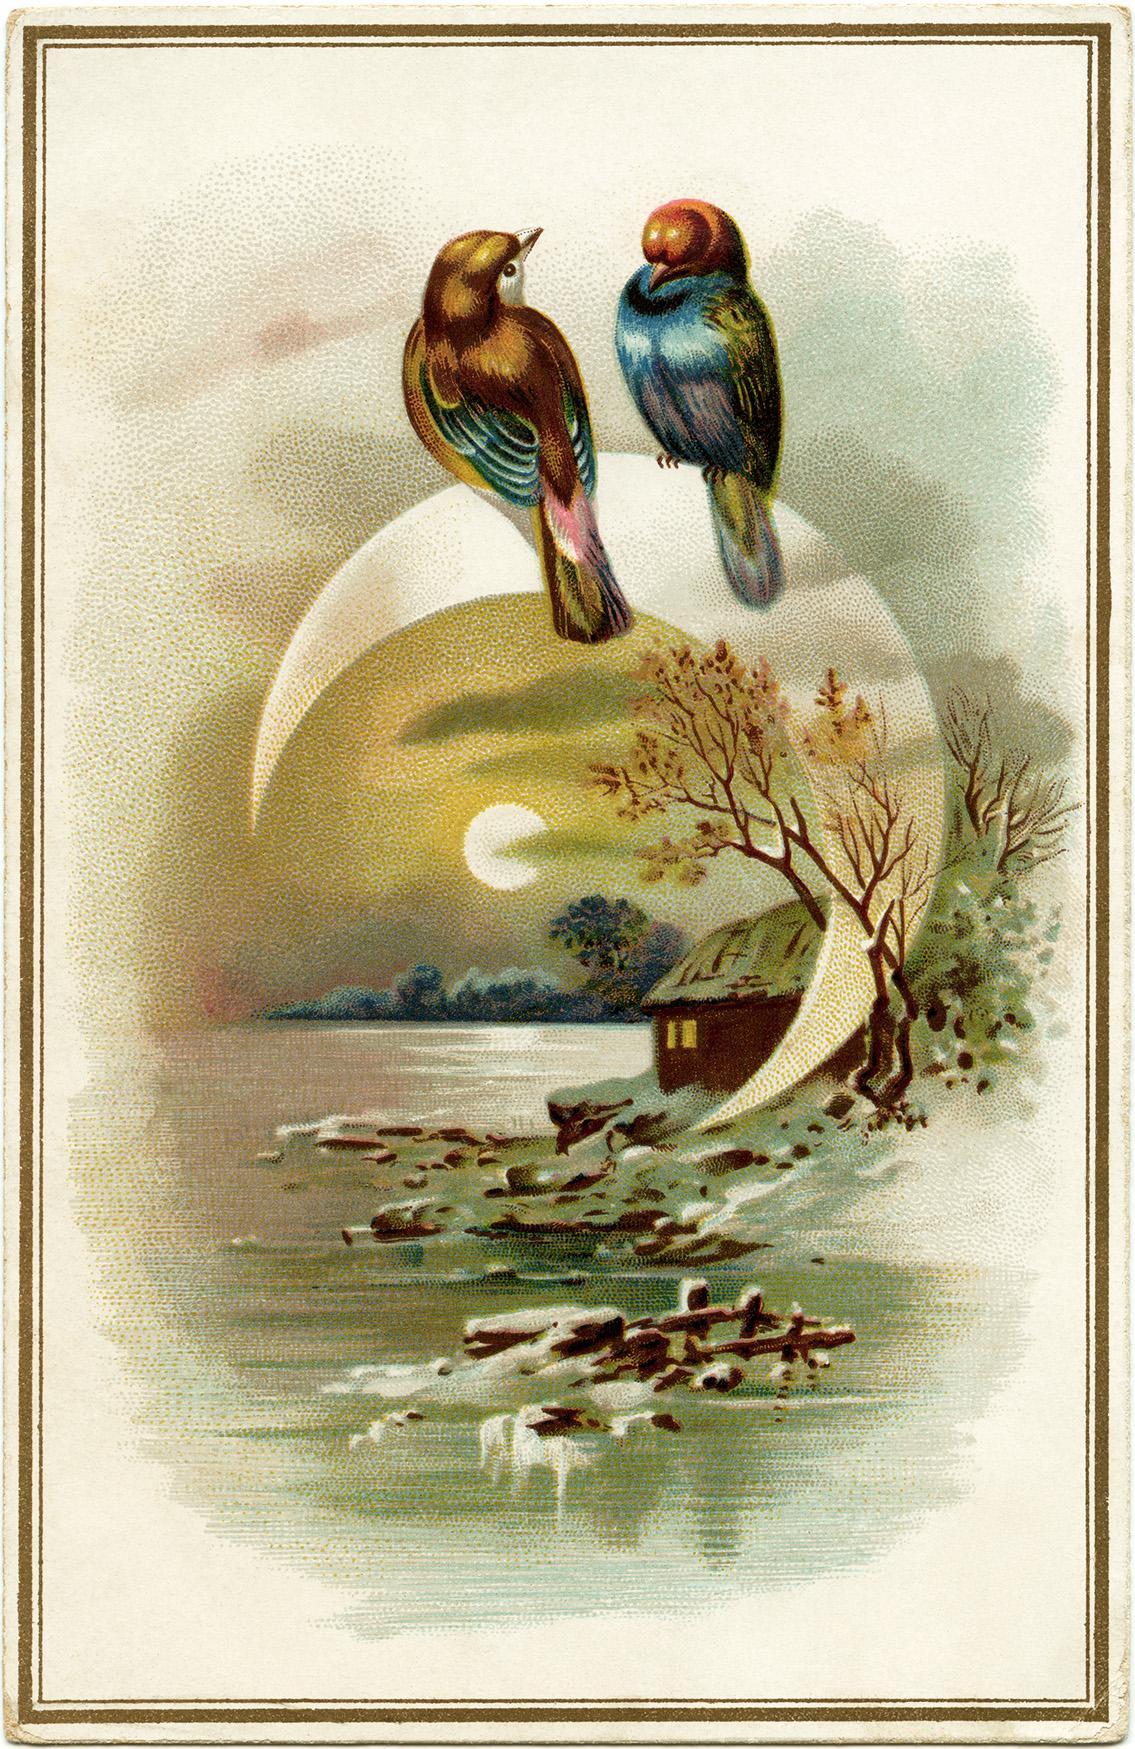 Evening Bird Scene ~ Free Vintage Image